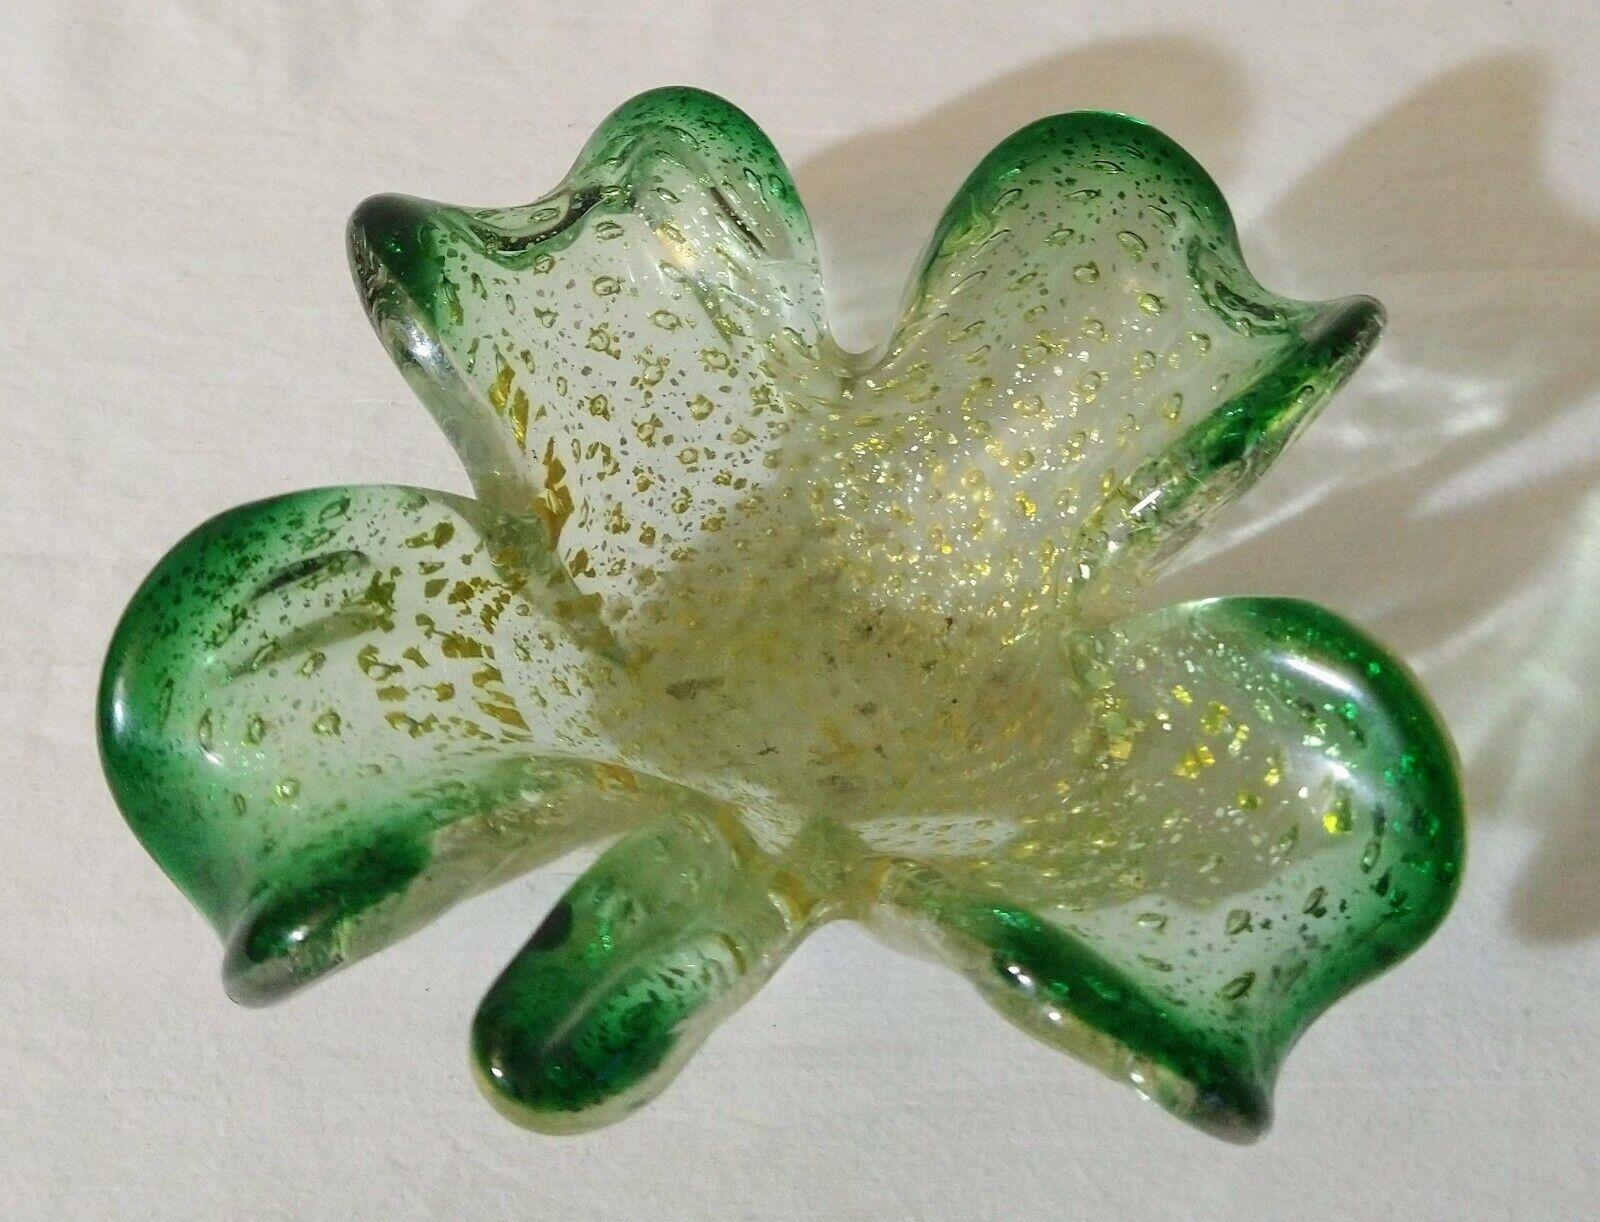 Vintage Murano Italian Art Glass Mid Century Modern Green W/Gold Fleck Bowl - $100.00